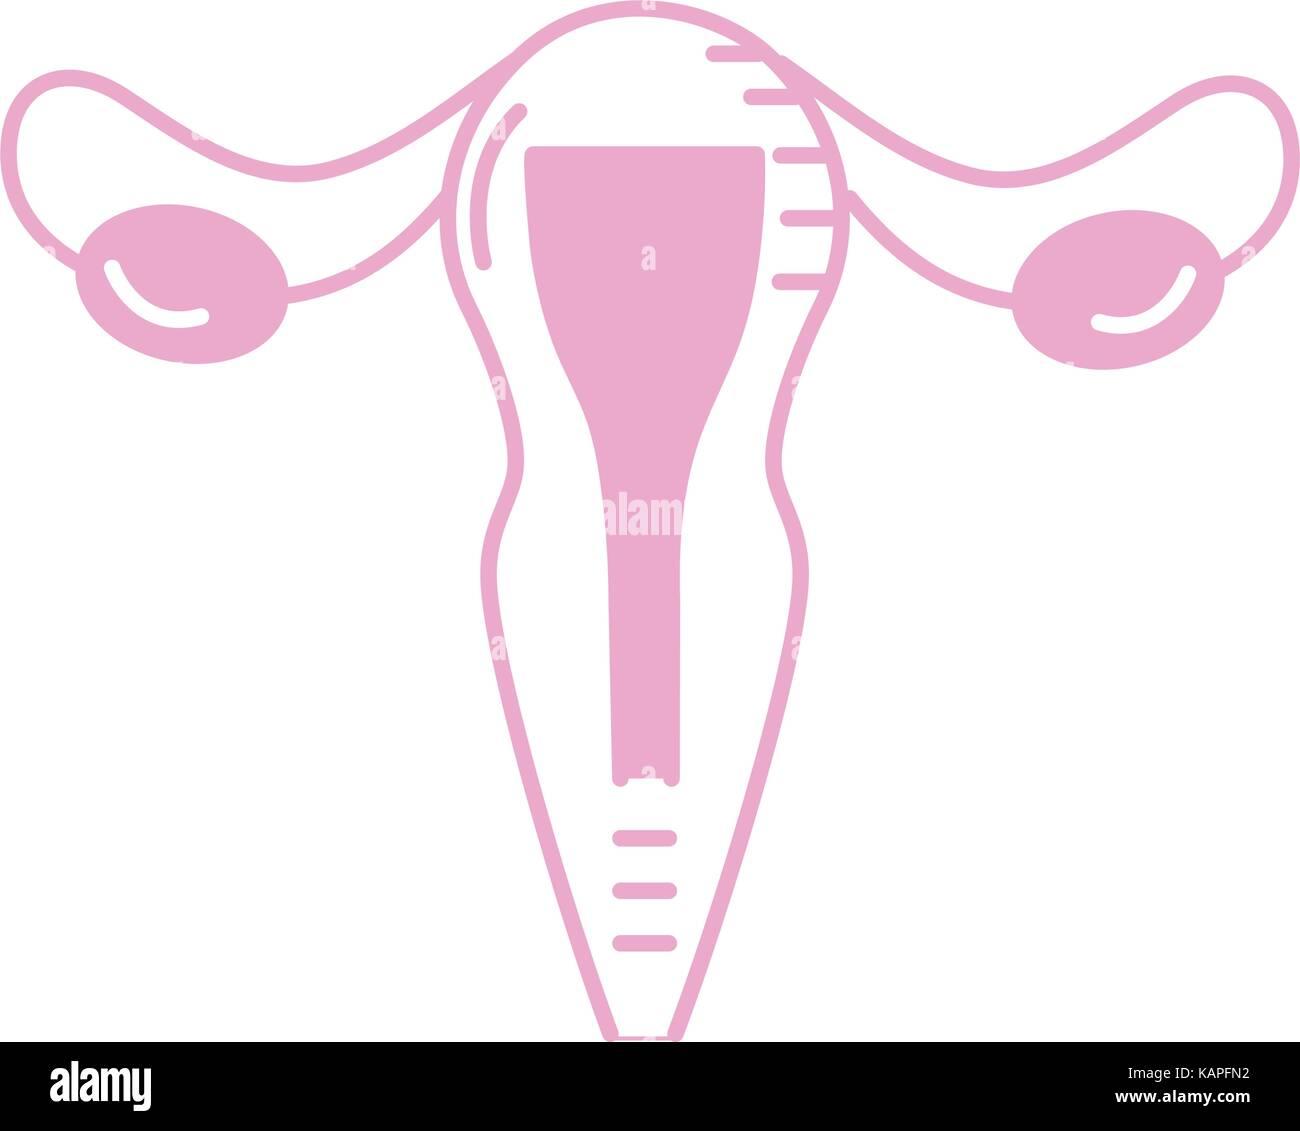 silhouette uterus fallopian tubes anatomy female Stock Vector Art ...